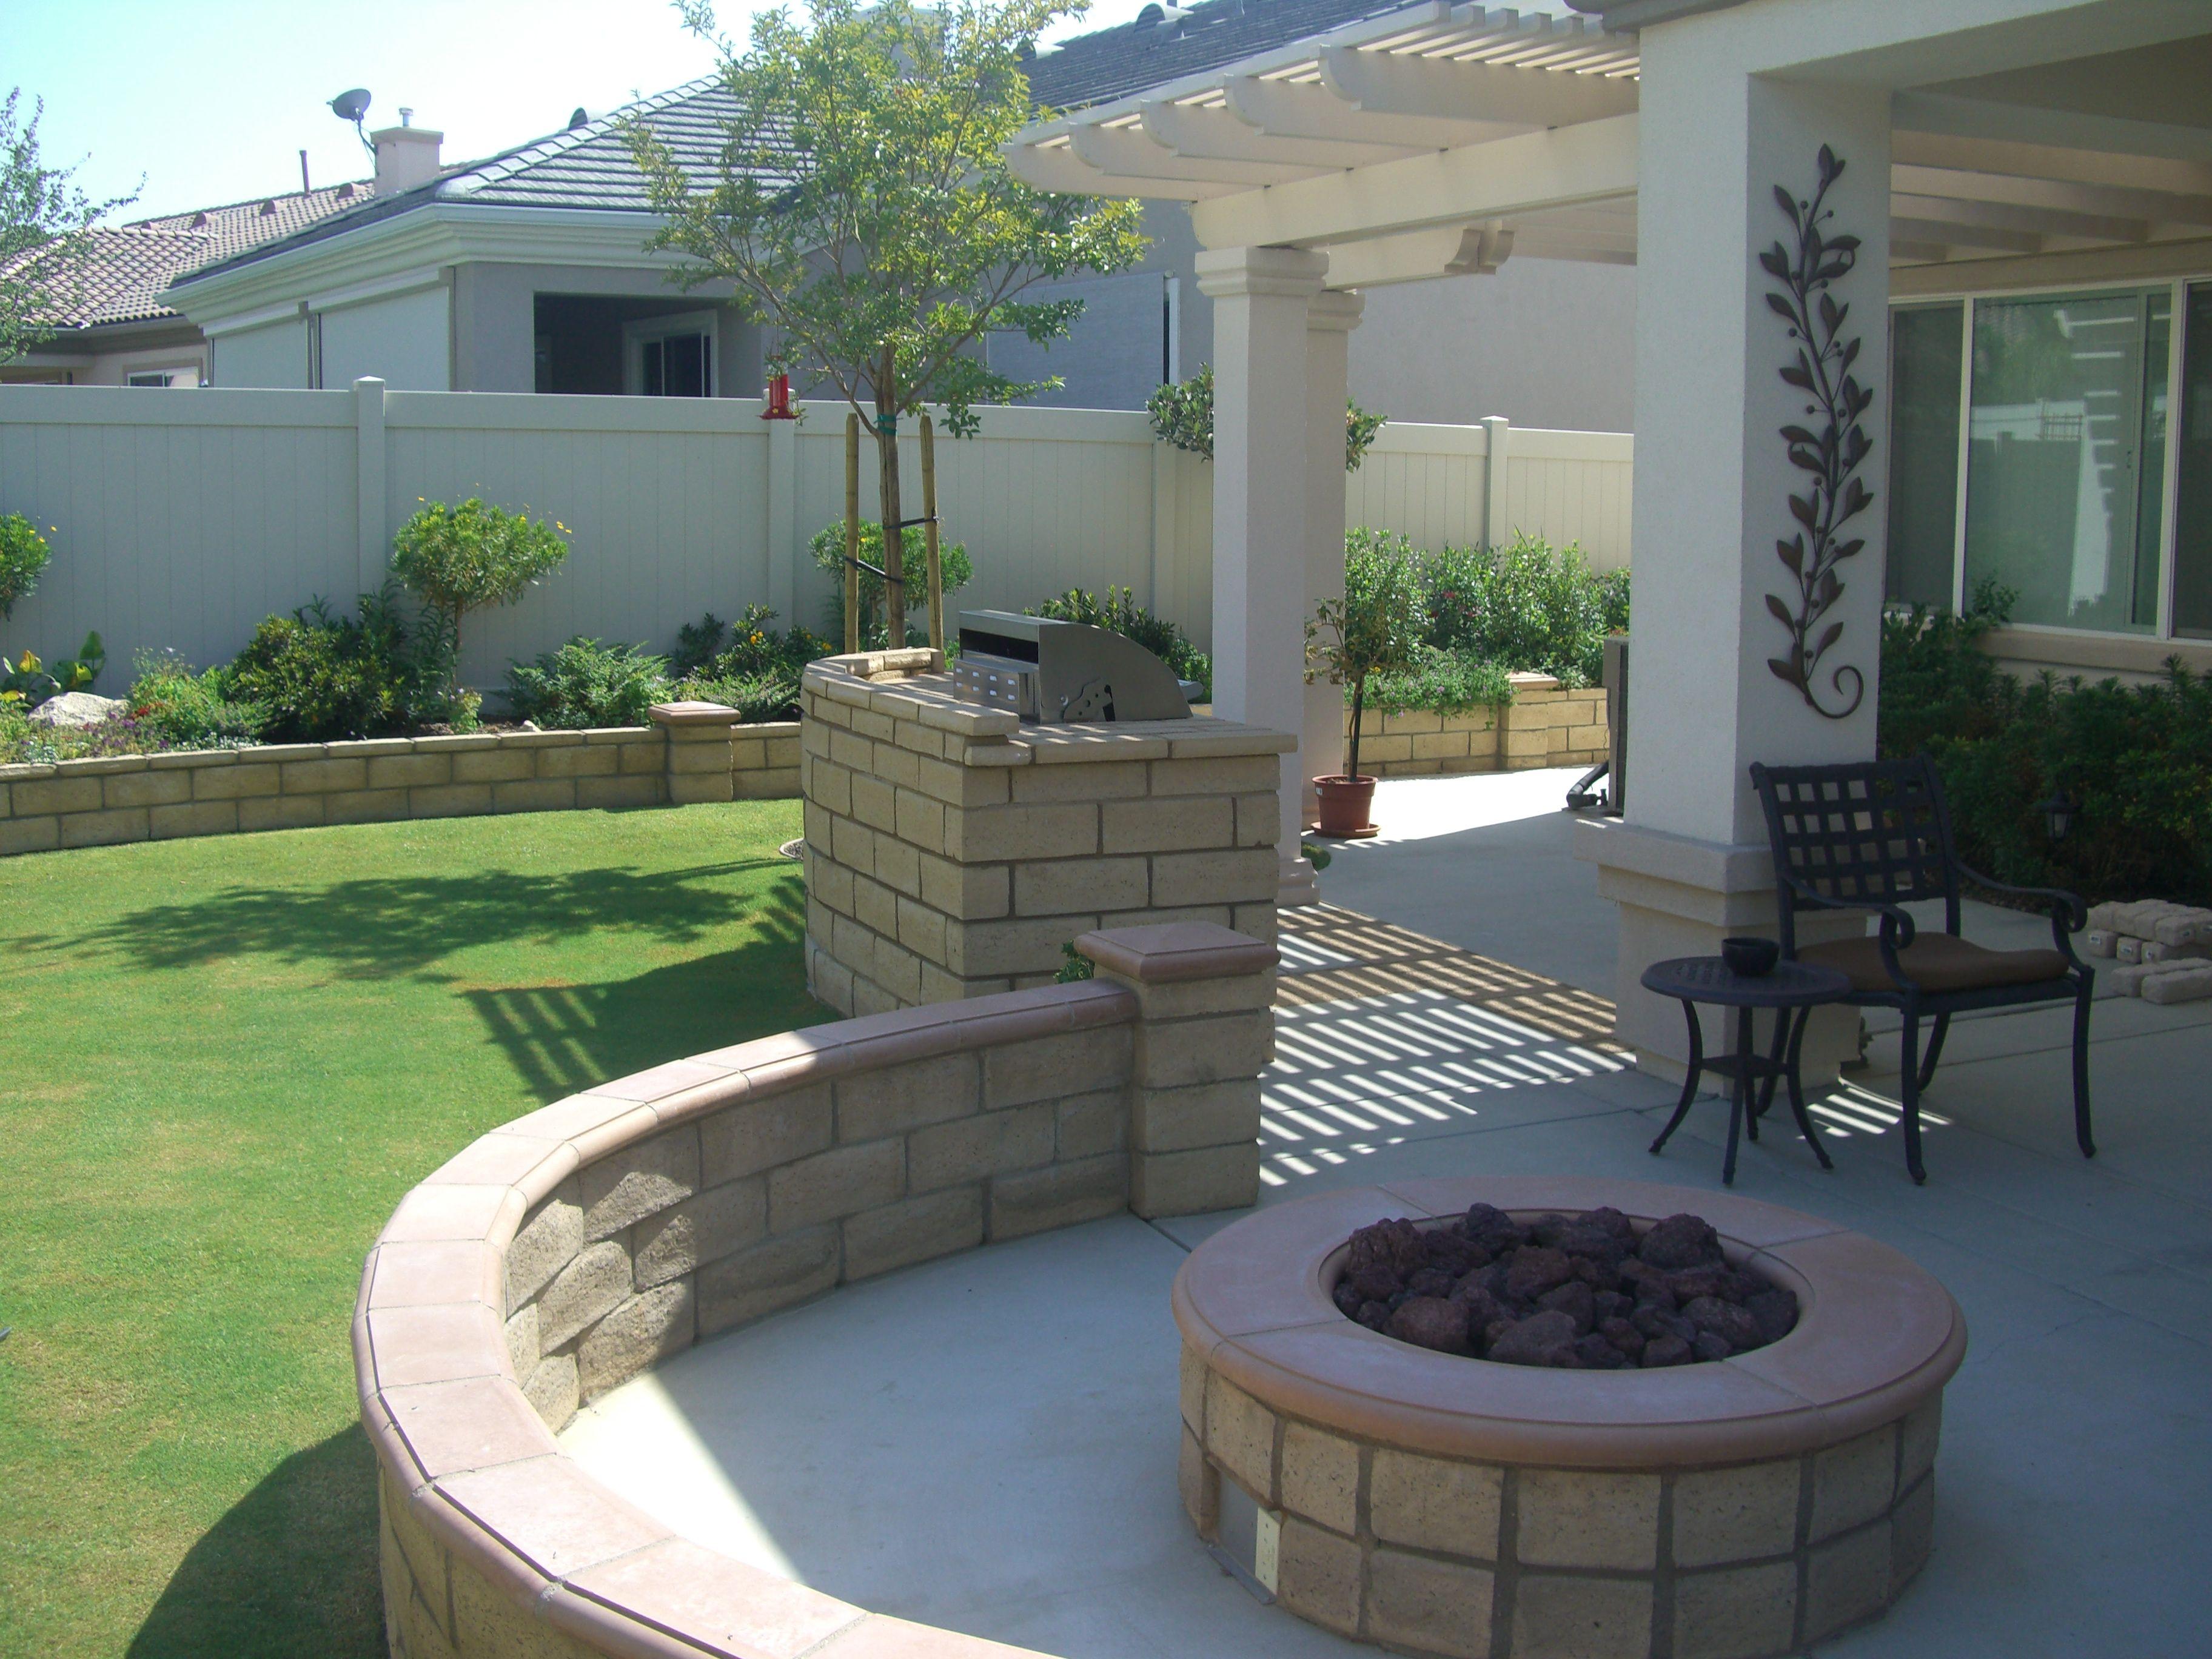 Best 25 Backyard patio designs ideas on Pinterest  Patio